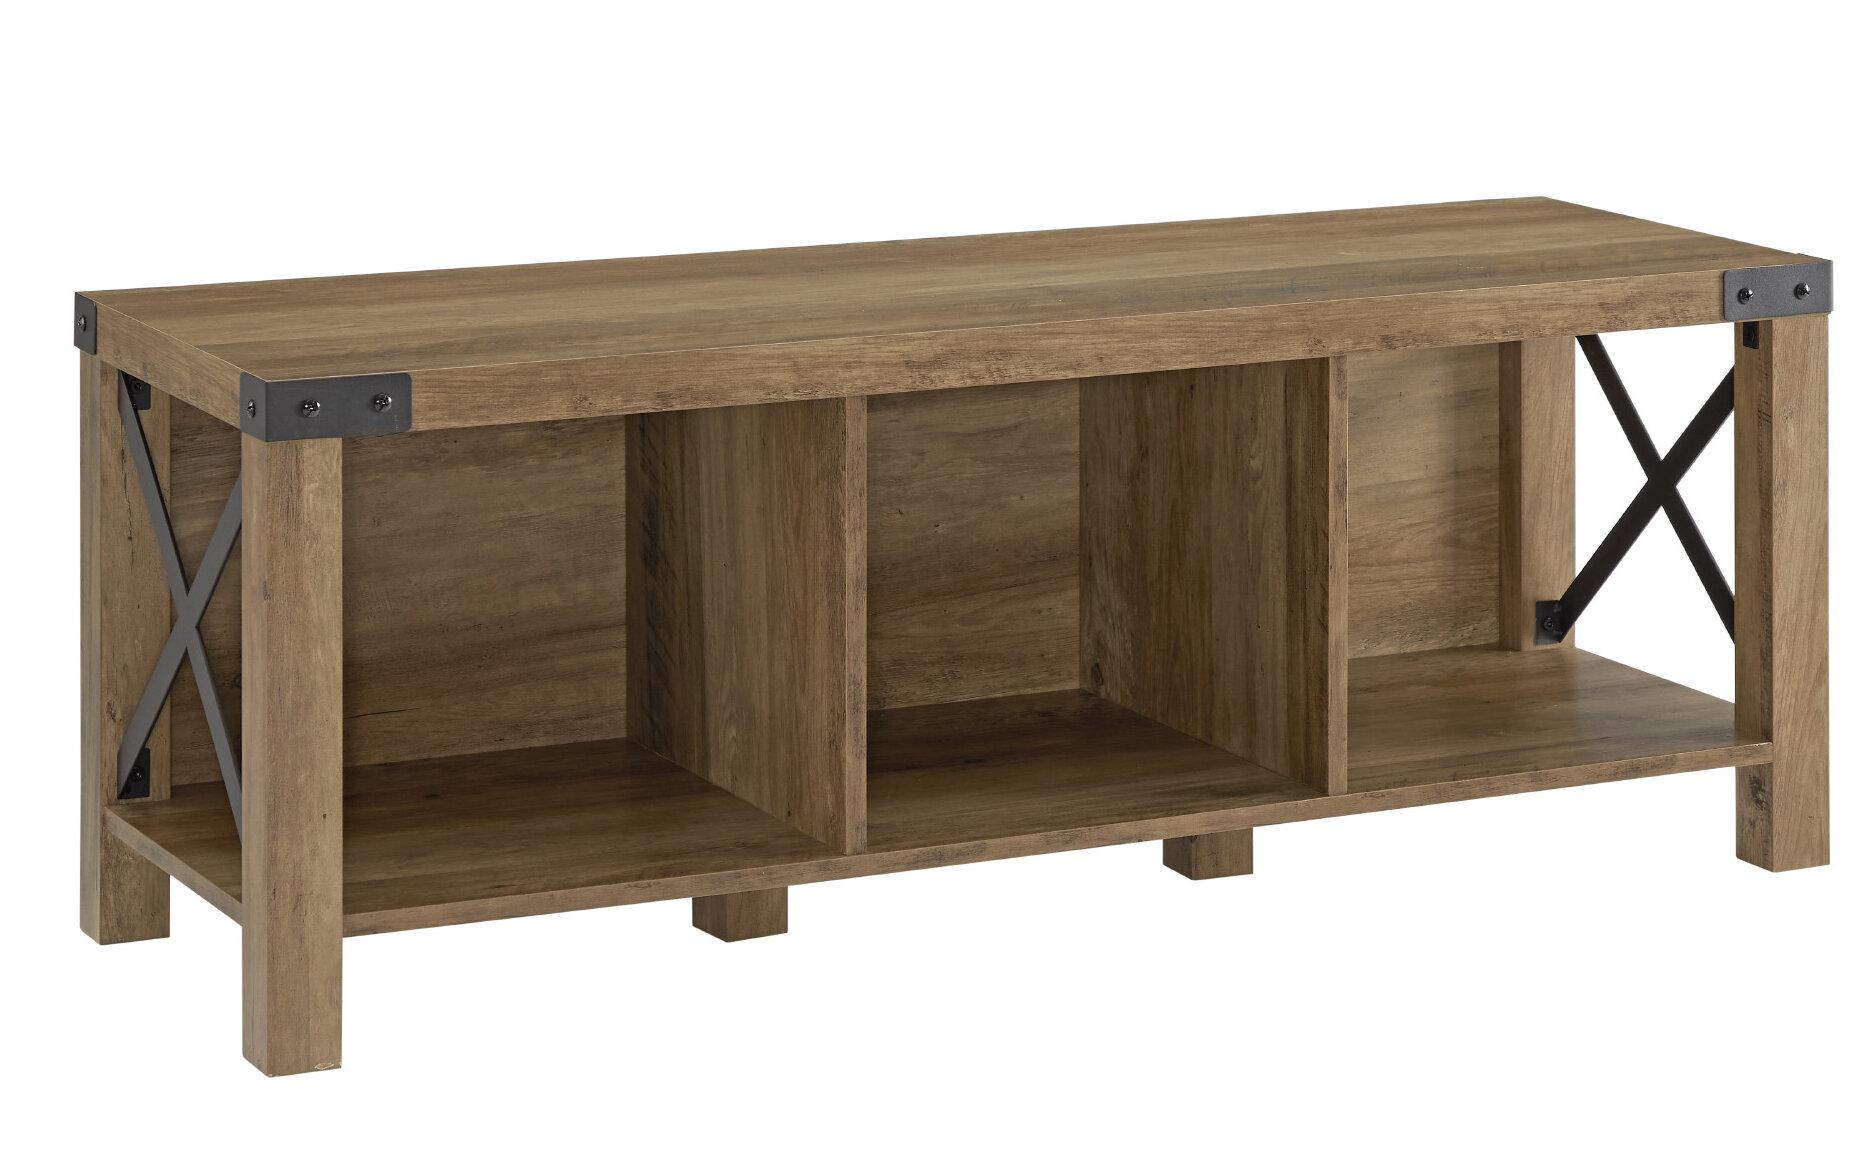 Peachy Gracie Oaks Kunz Storage Bench Pabps2019 Chair Design Images Pabps2019Com